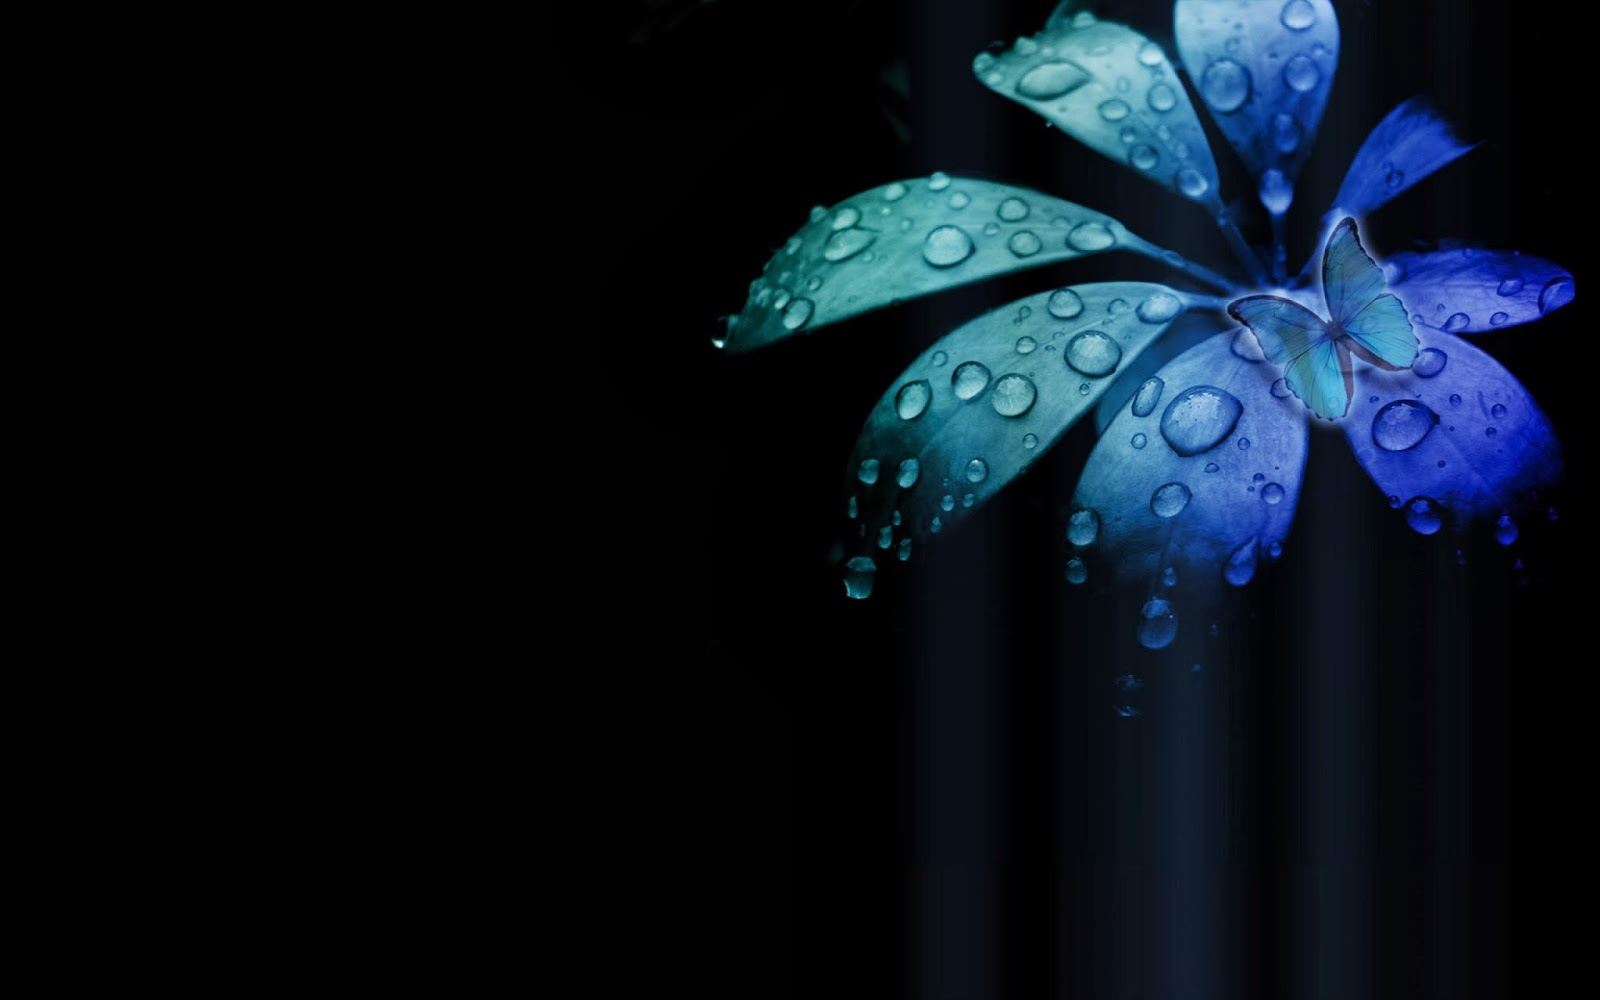 Abstract Wallpaper Black Hearts Blue 3d And Hd Wallpaper: خلفيات سوداء 2014